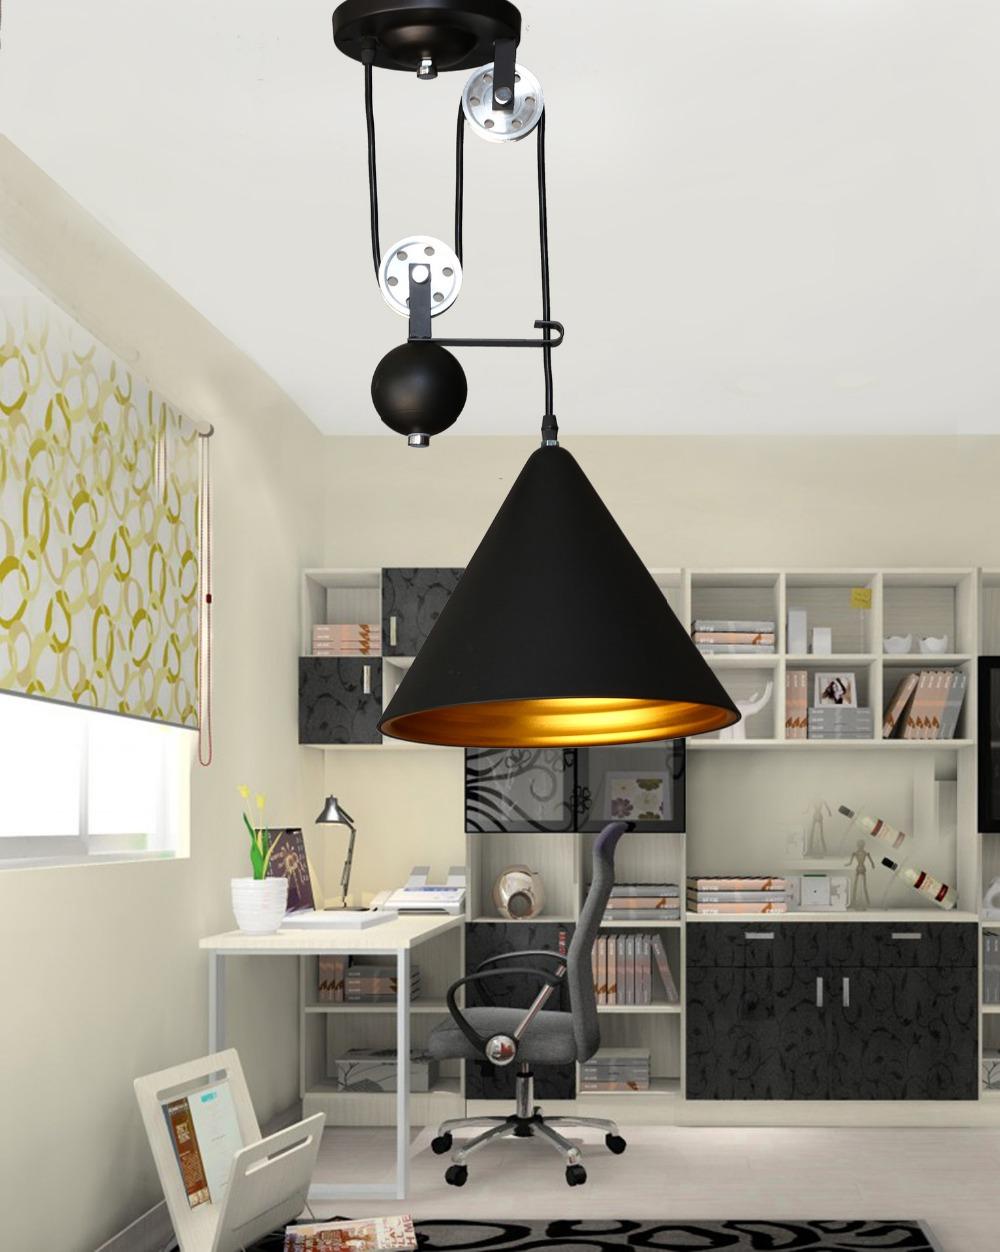 Kegel lamp koop goedkope kegel lamp loten van chinese kegel lamp ...